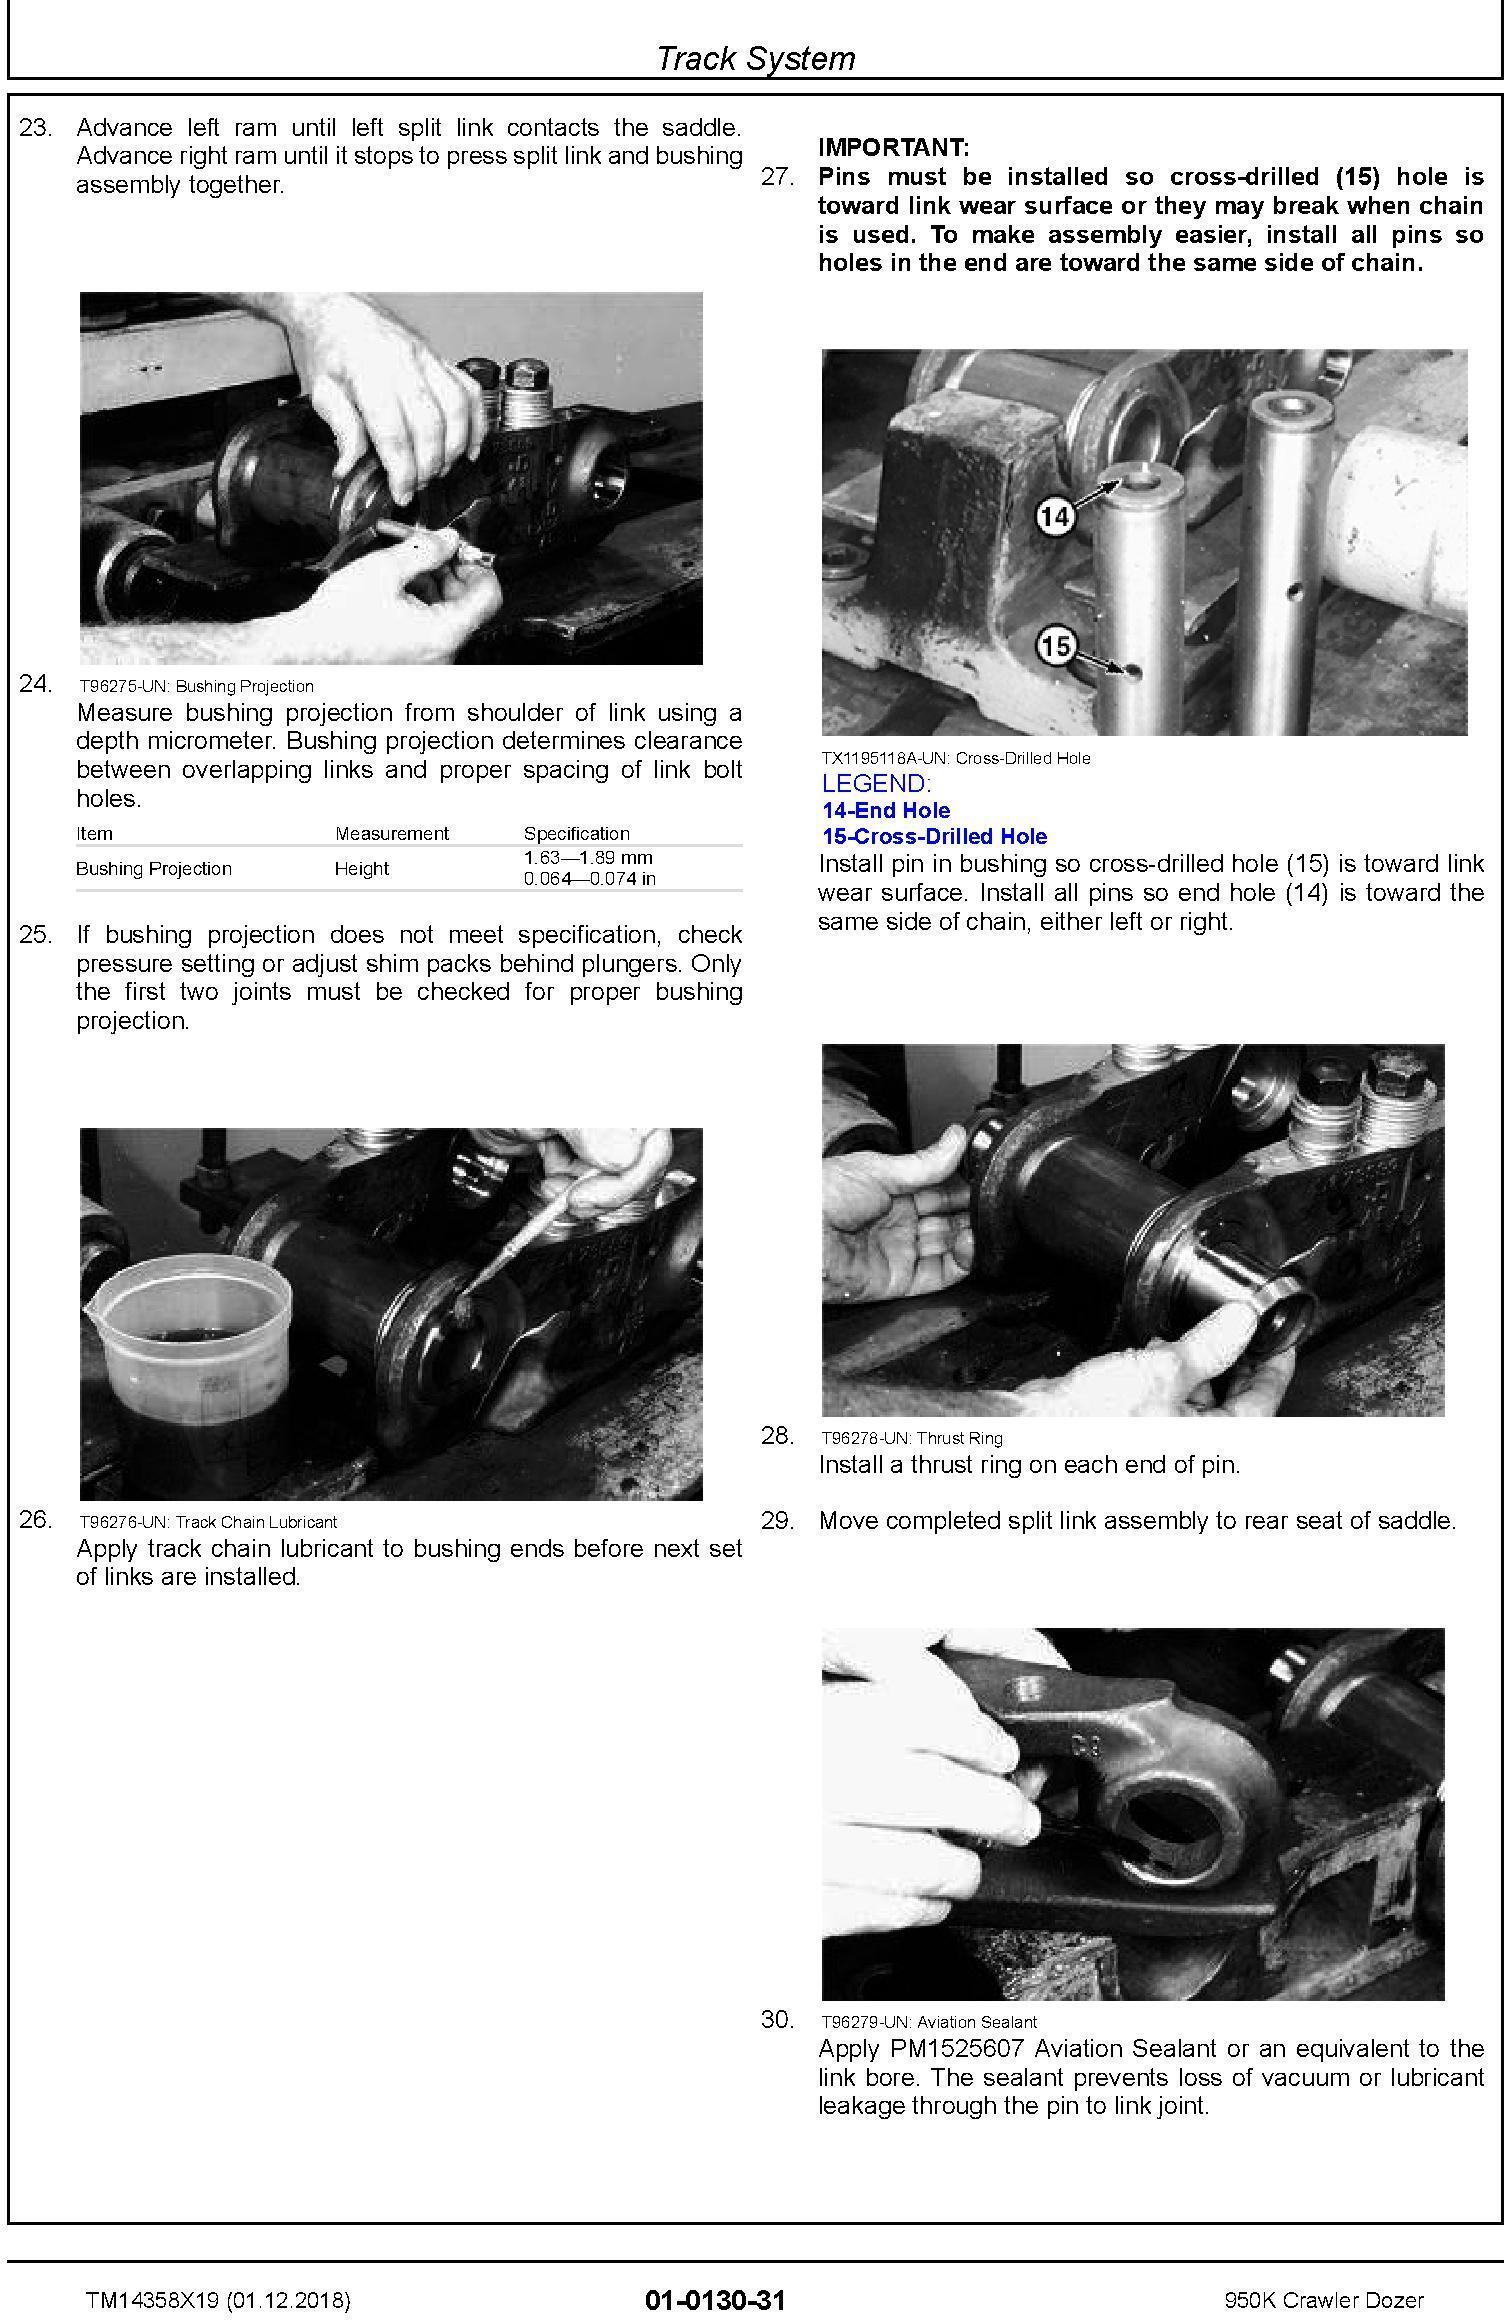 John Deere 950K Crawler Dozer Repair Technical Manual (TM14358X19) - 2